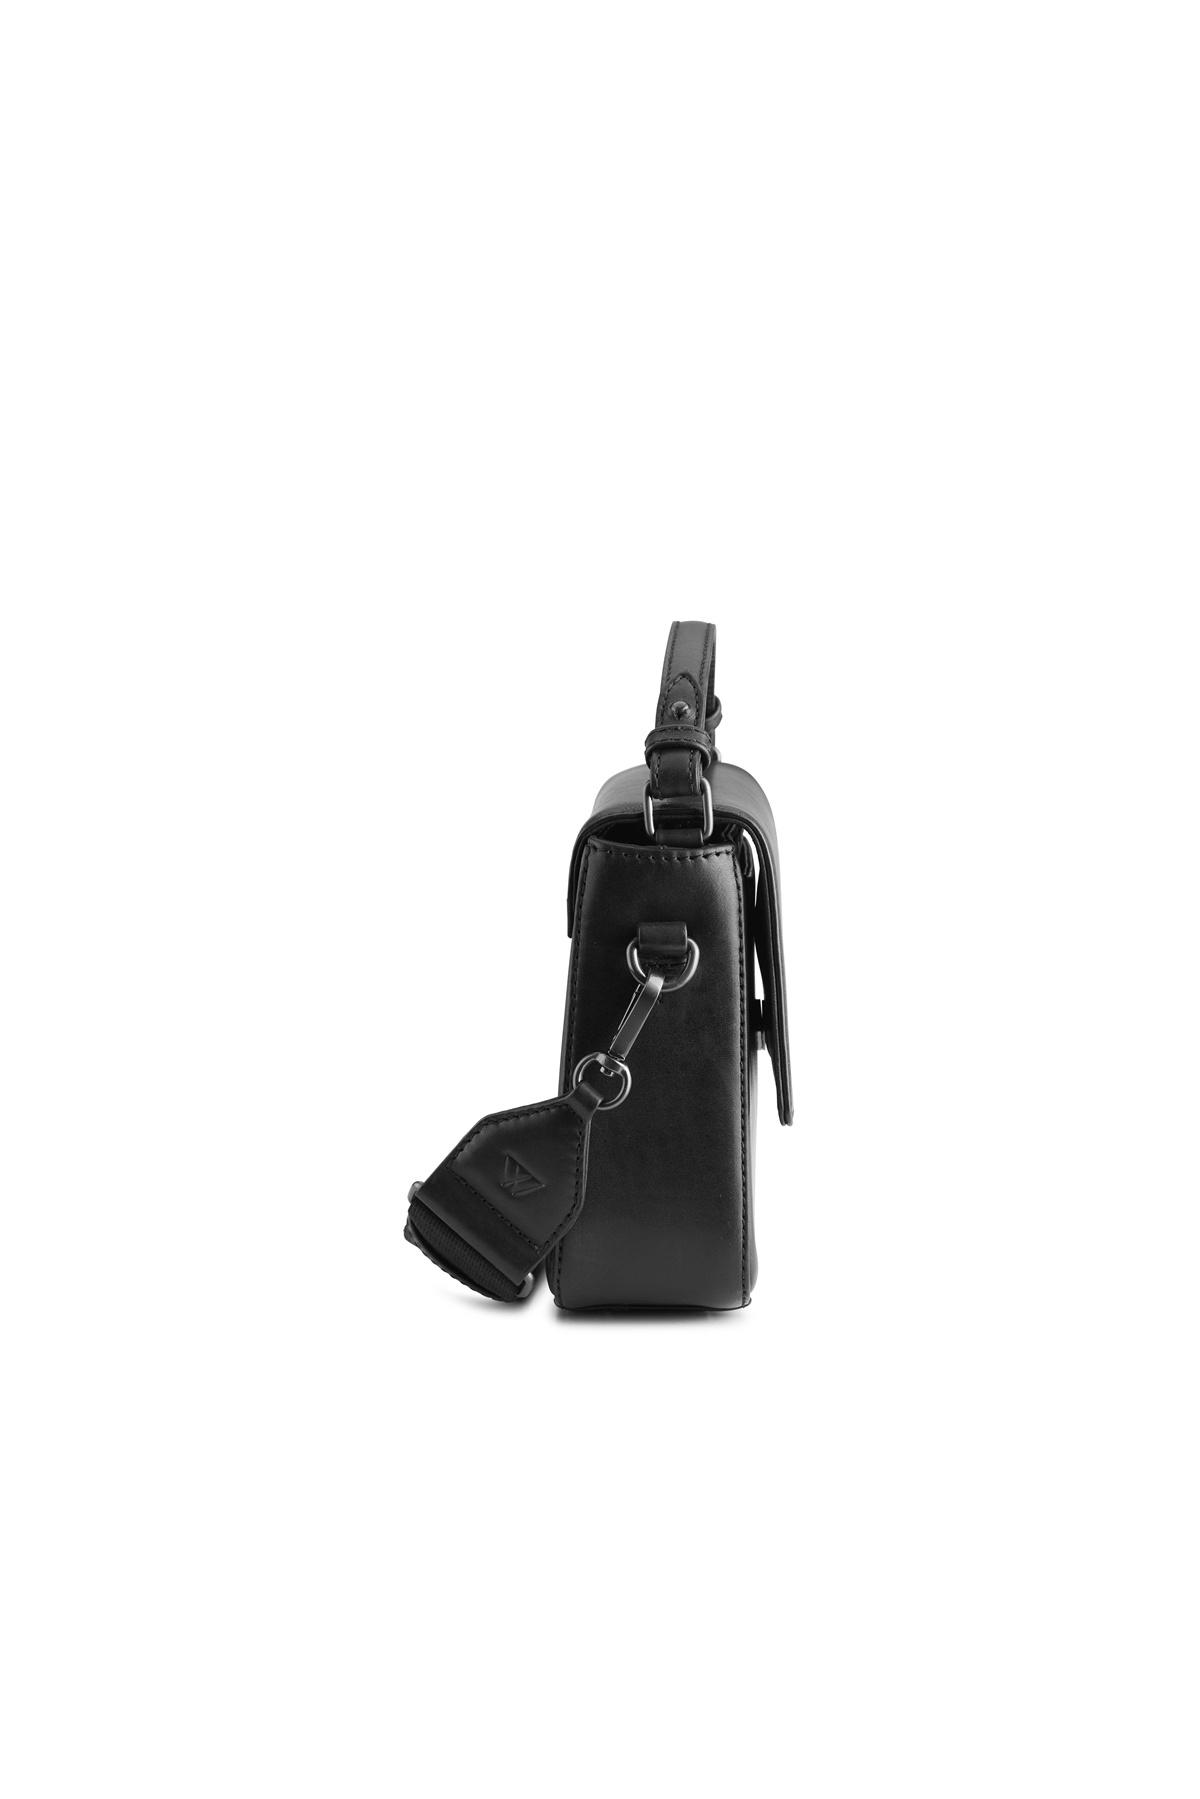 Adora Large Crossbody Bag - Antique Black w/ Black-8